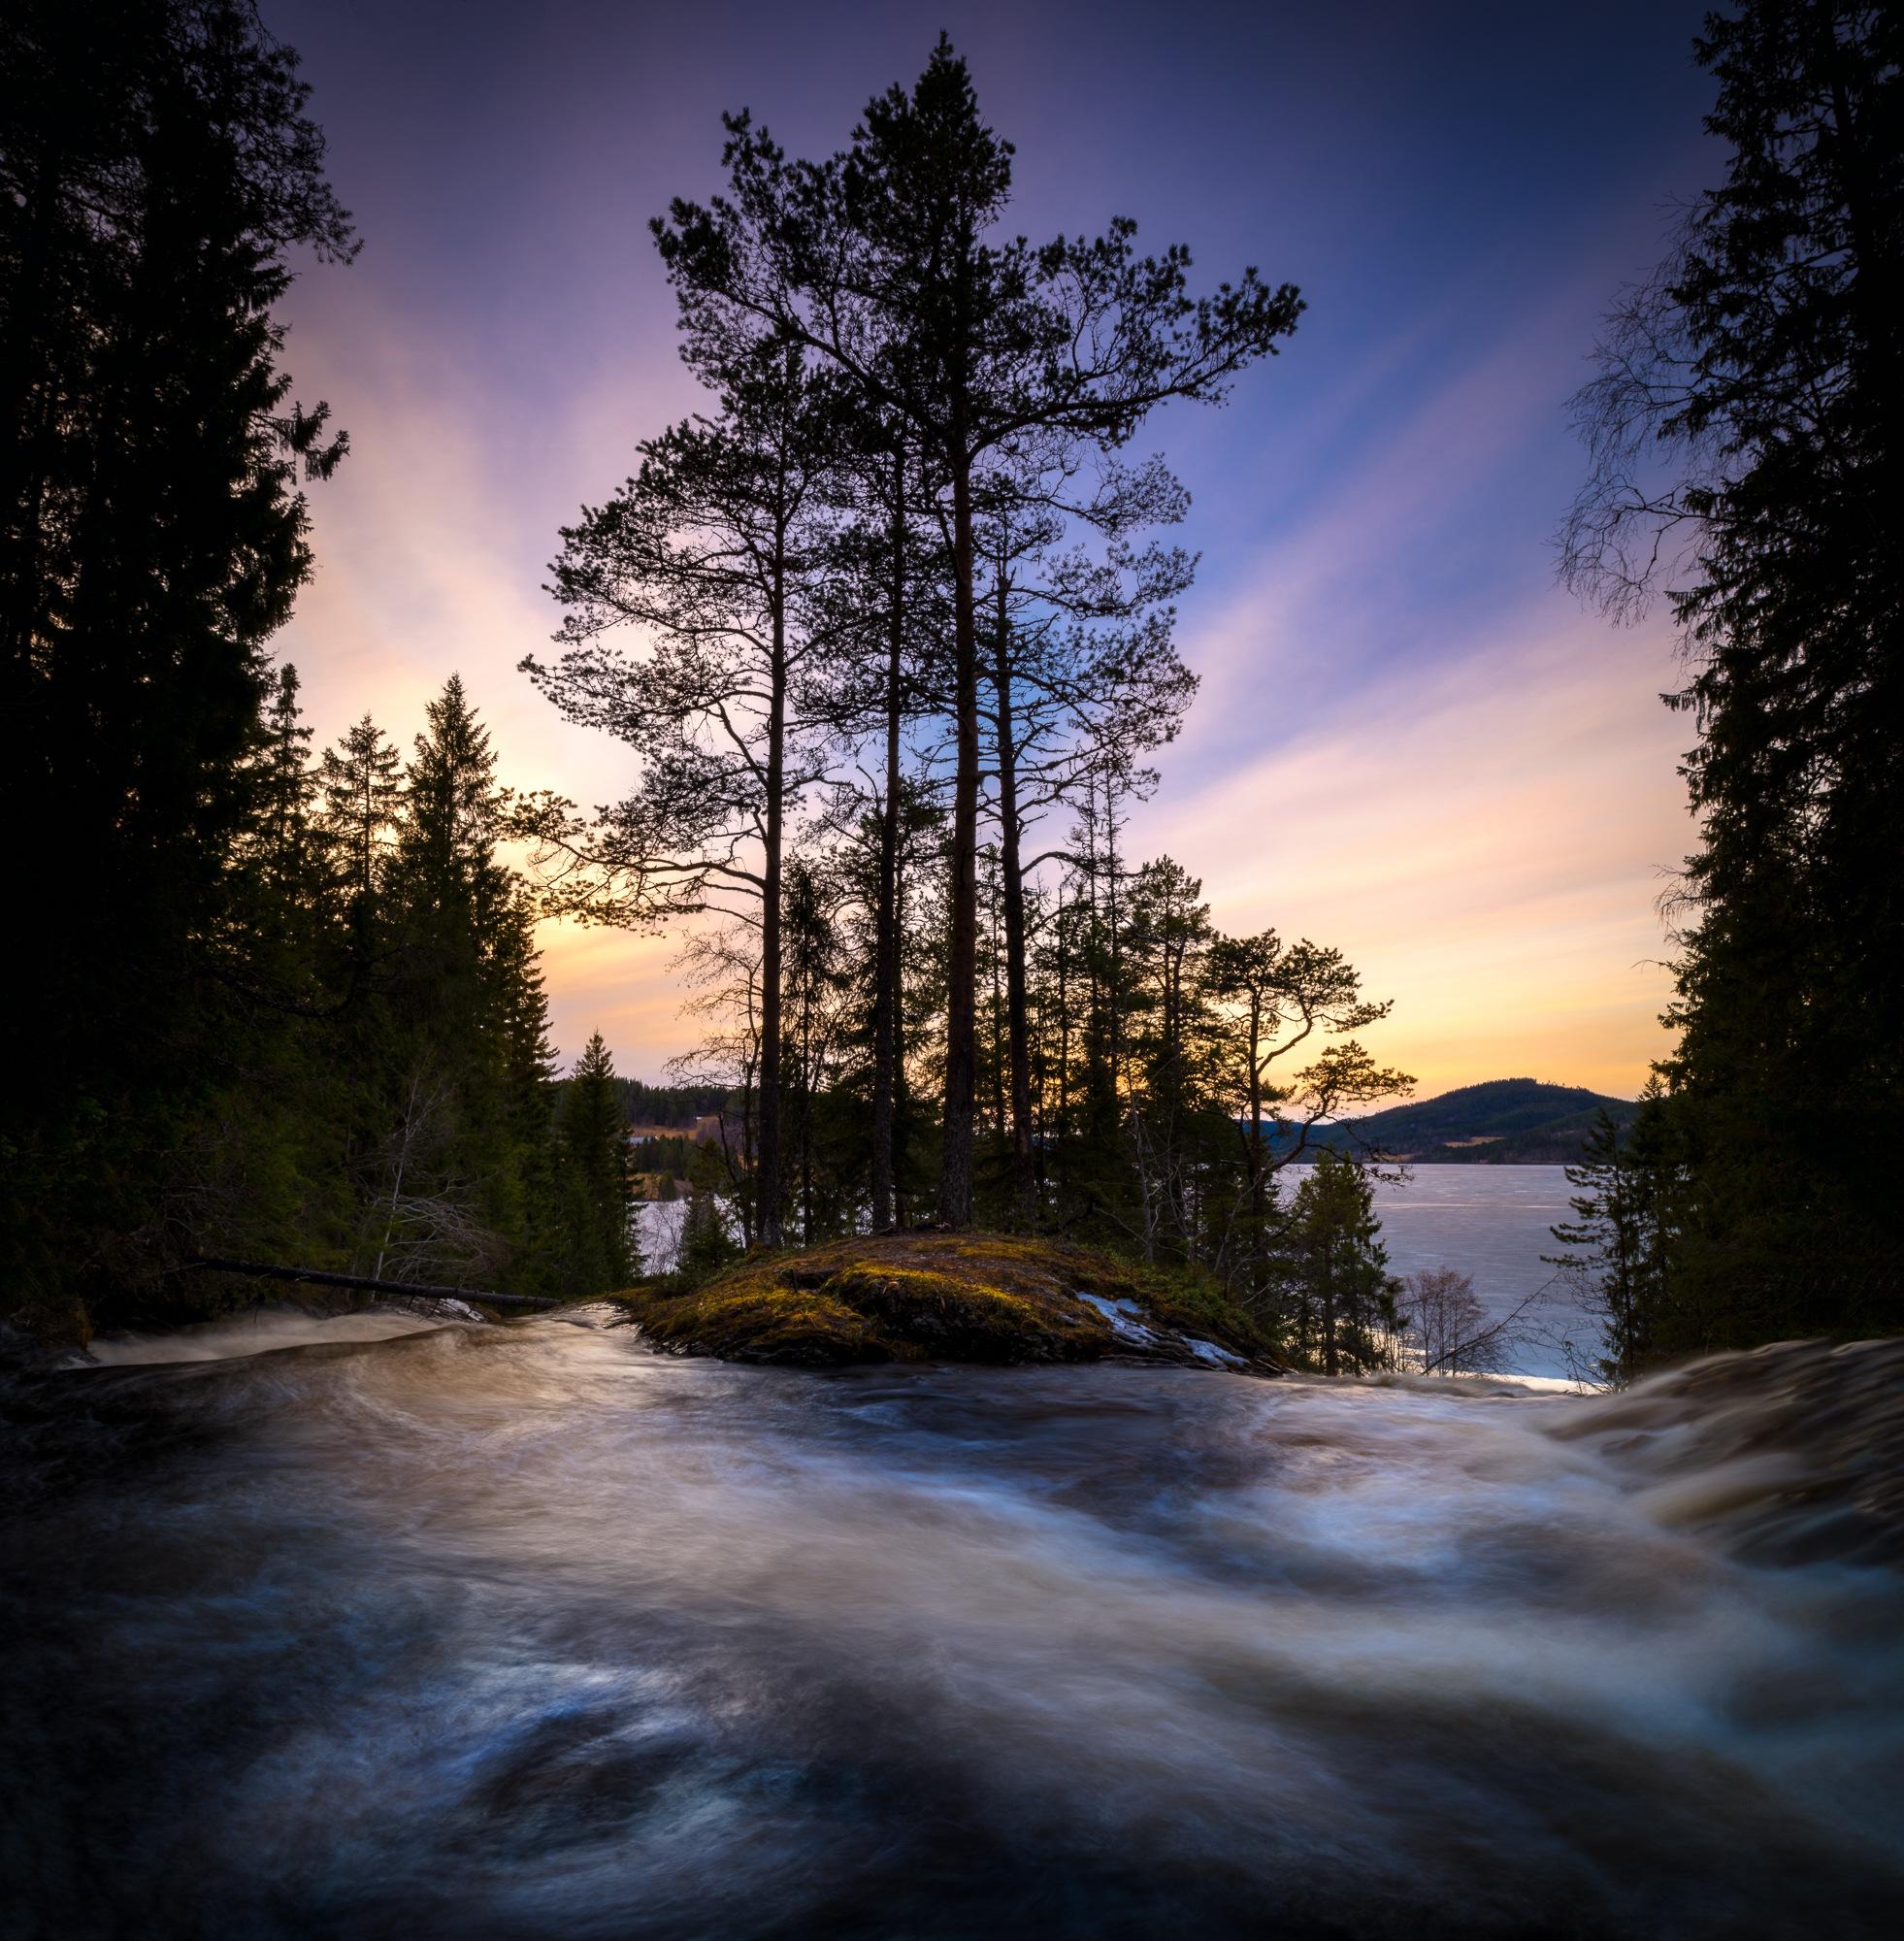 Jonsvannet sunset  by oeyskarl